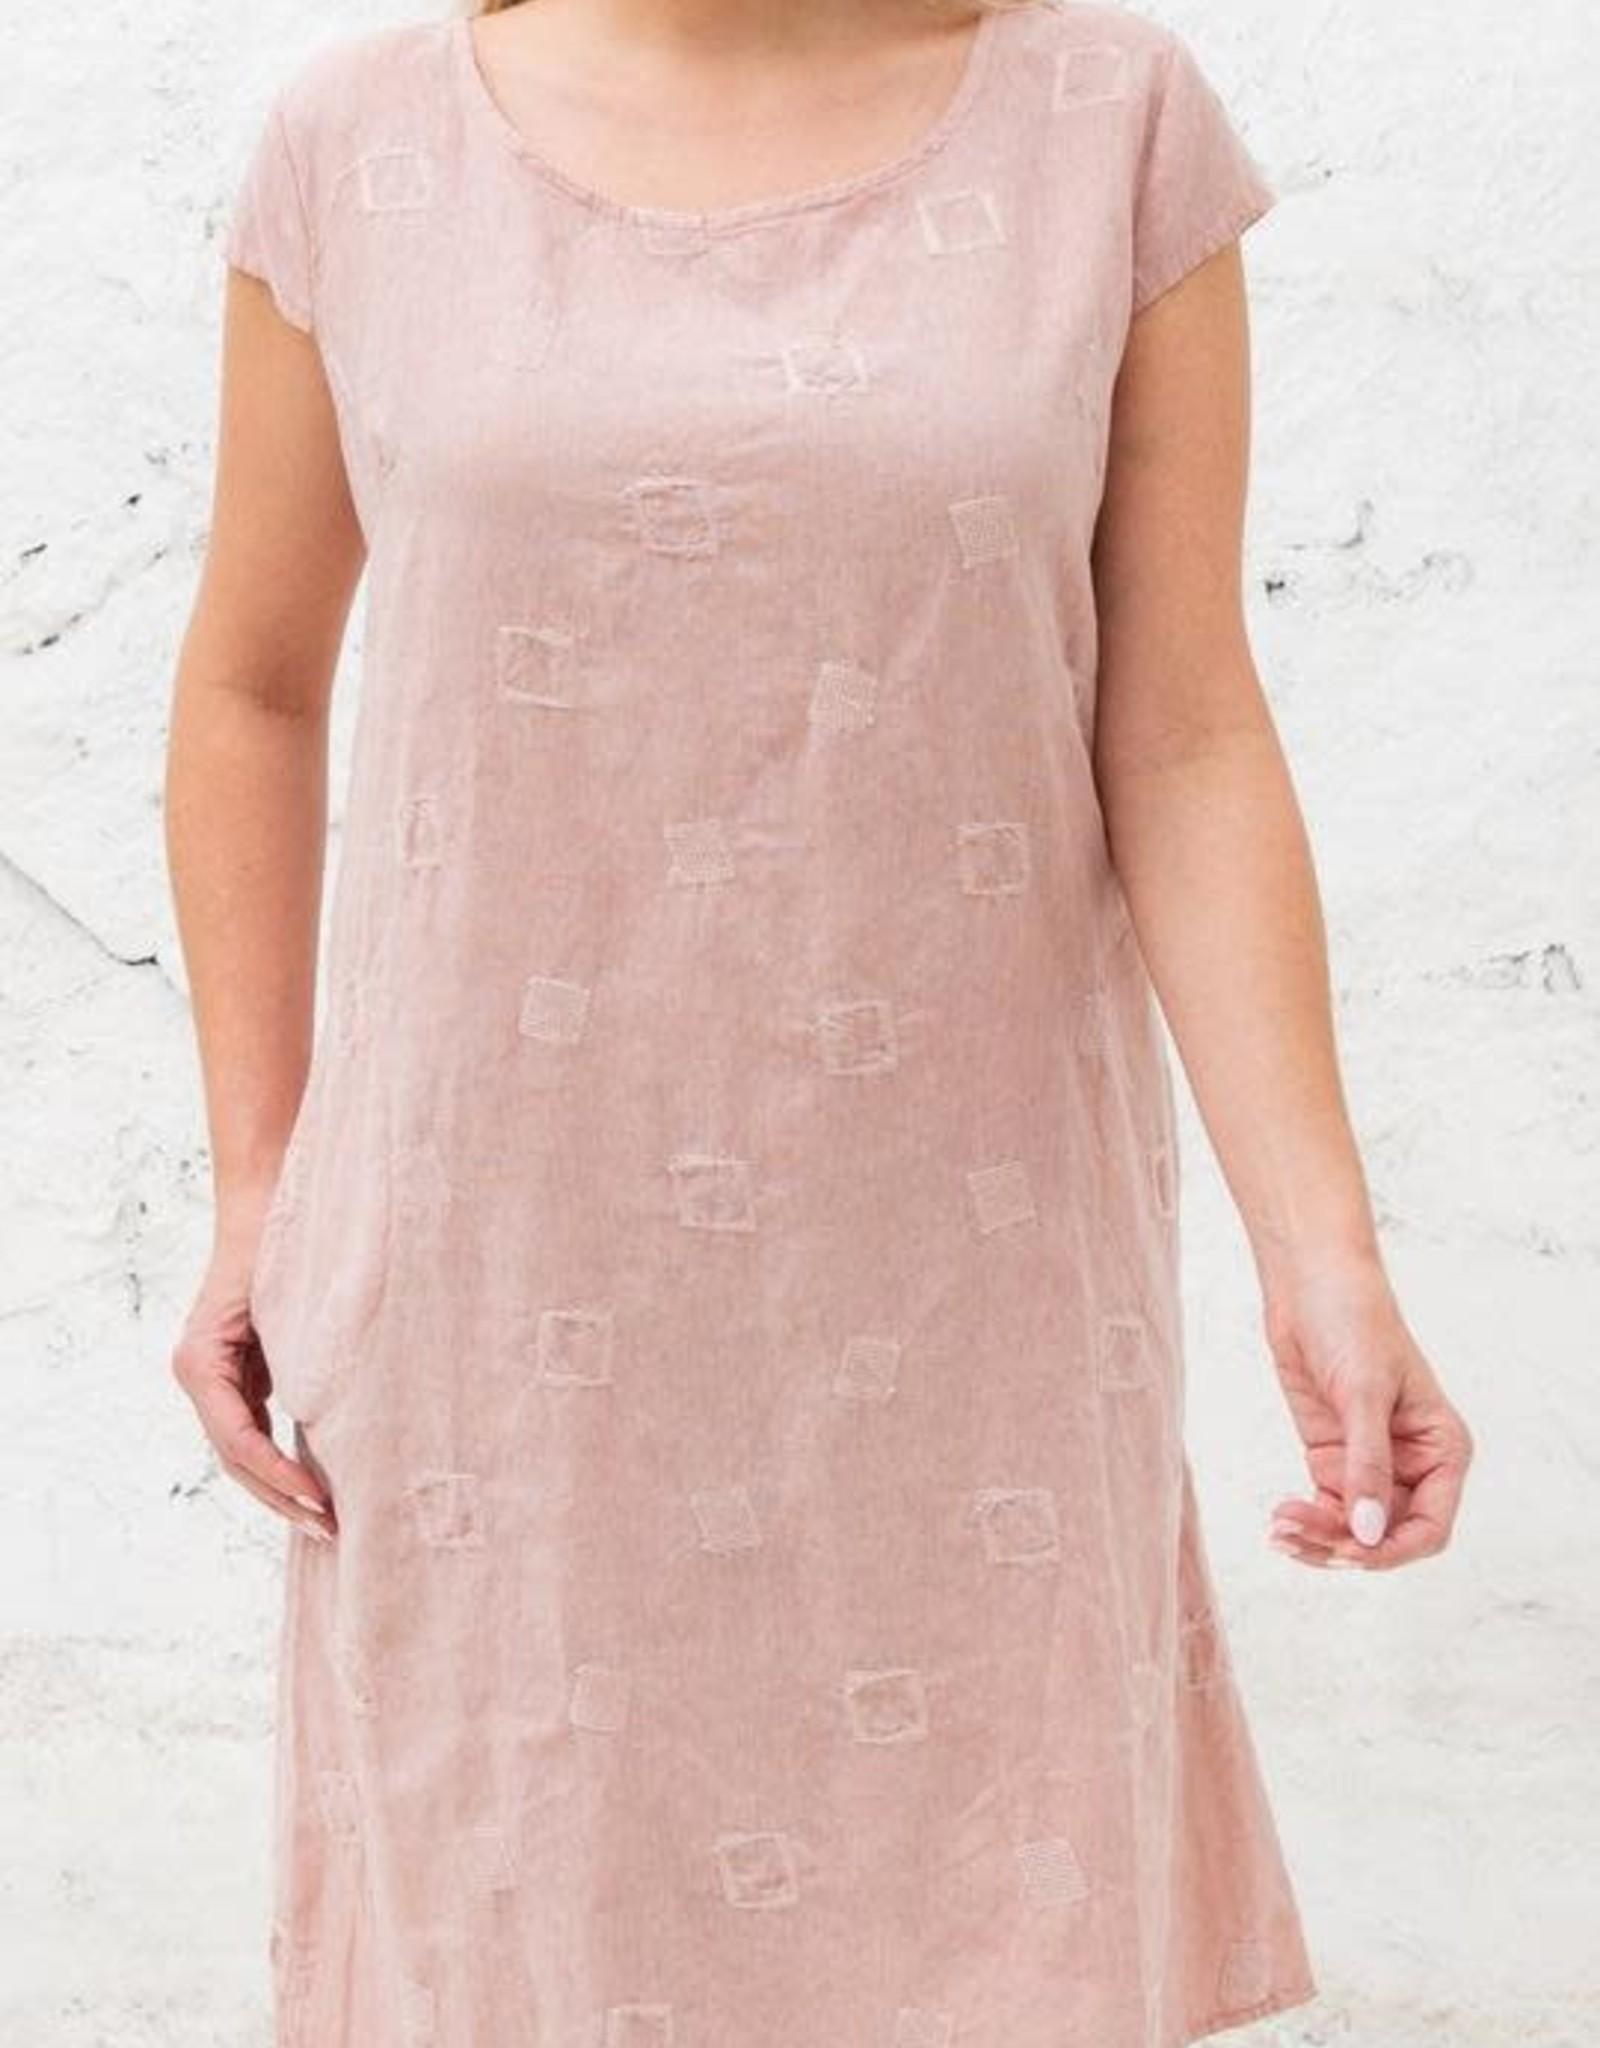 Cobblestone Cobblestone Chloe Rose Market Dress